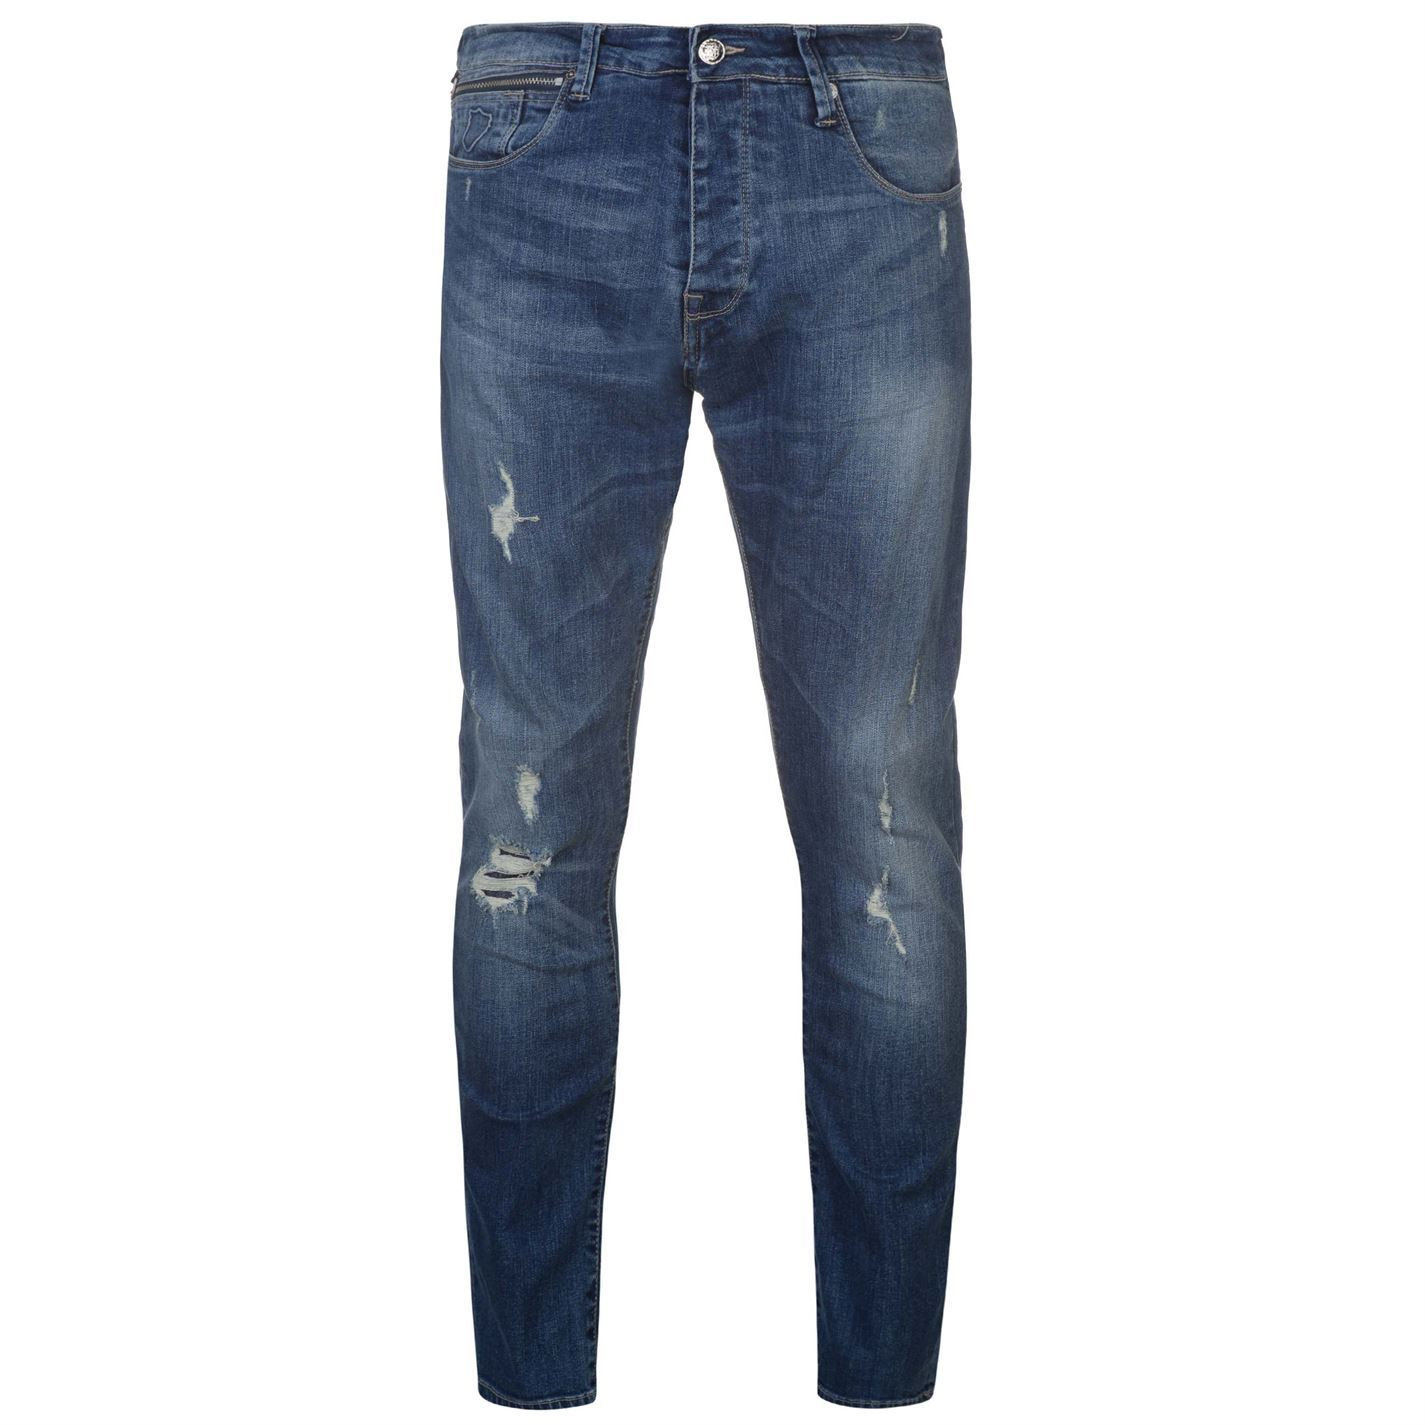 Mens Black Bootcut Jeans